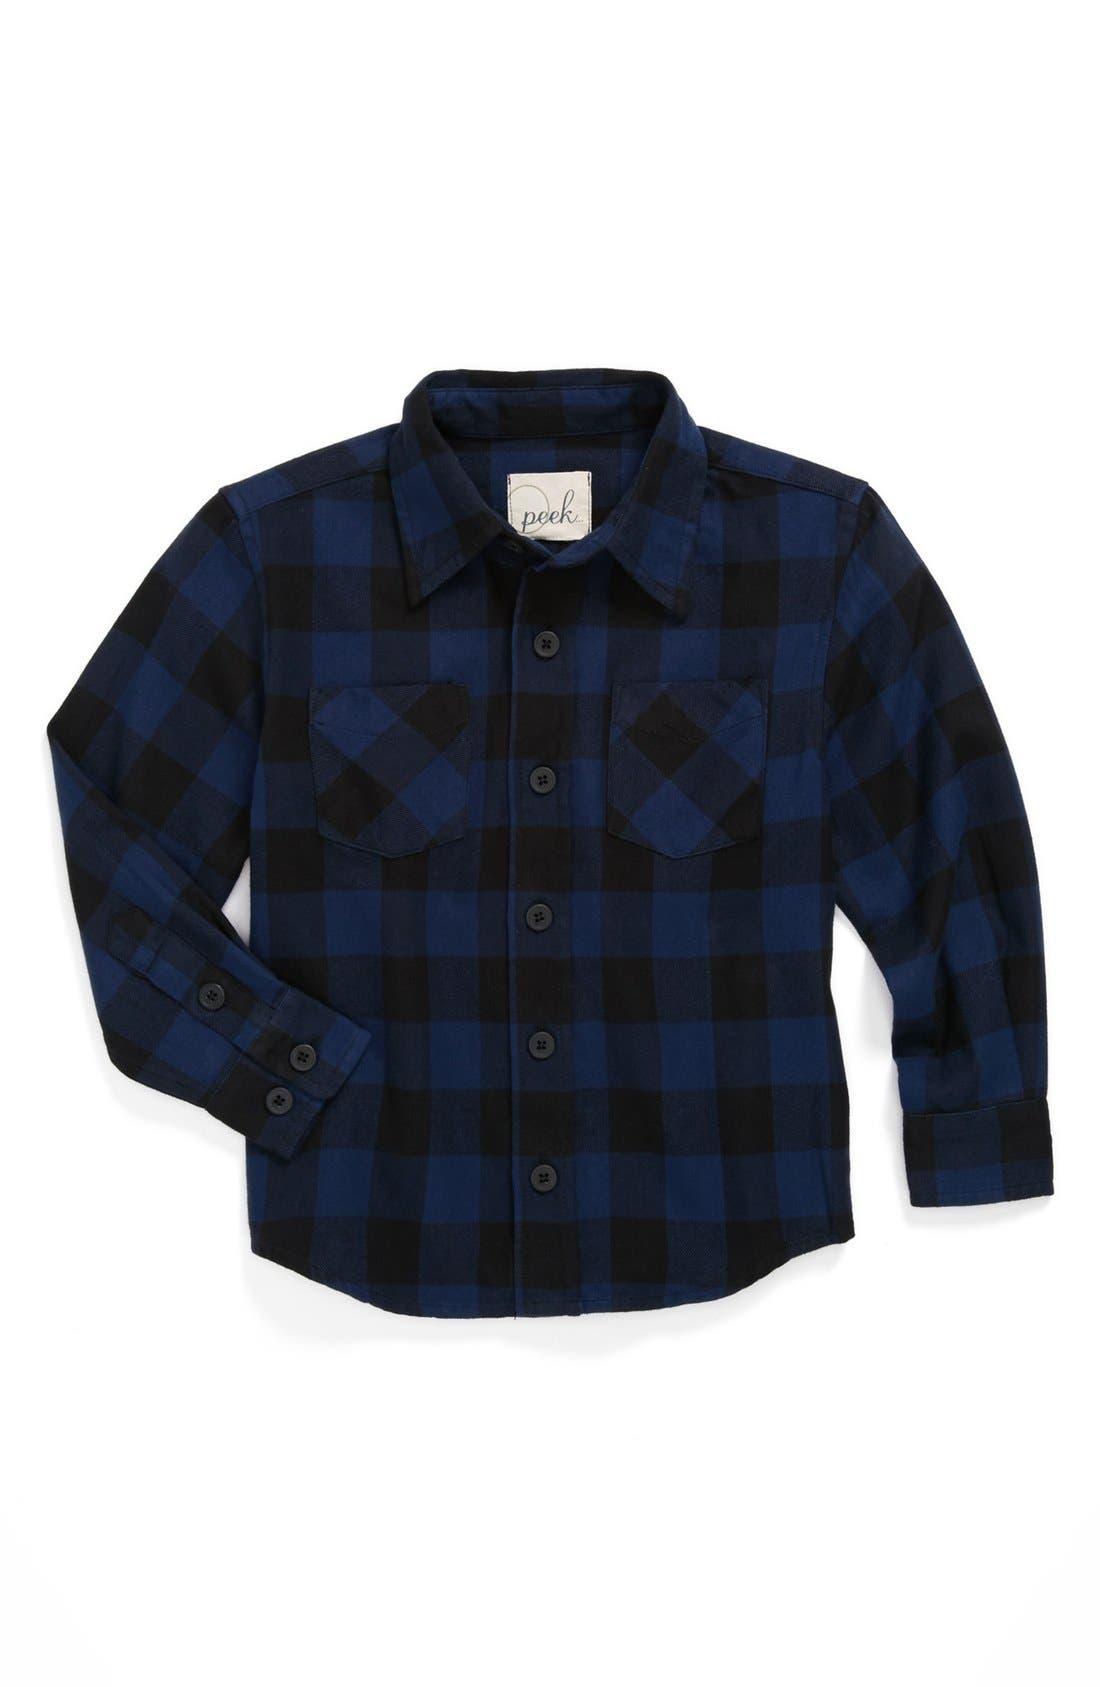 Alternate Image 1 Selected - Peek Plaid Shirt & Jeans (Baby Boys)